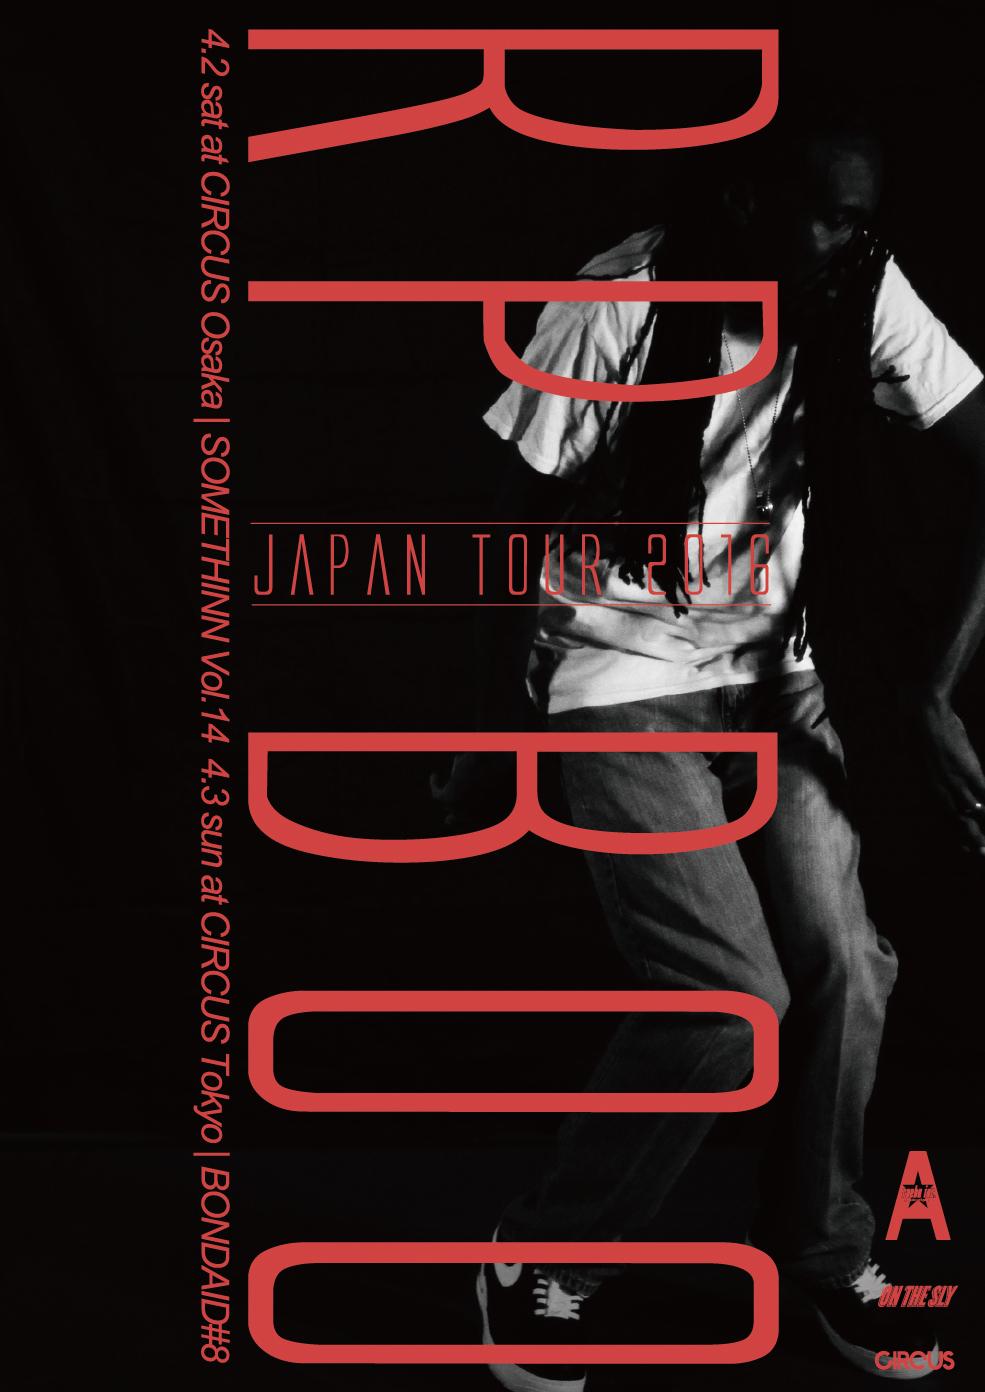 RP Boo Japan Tour 2016